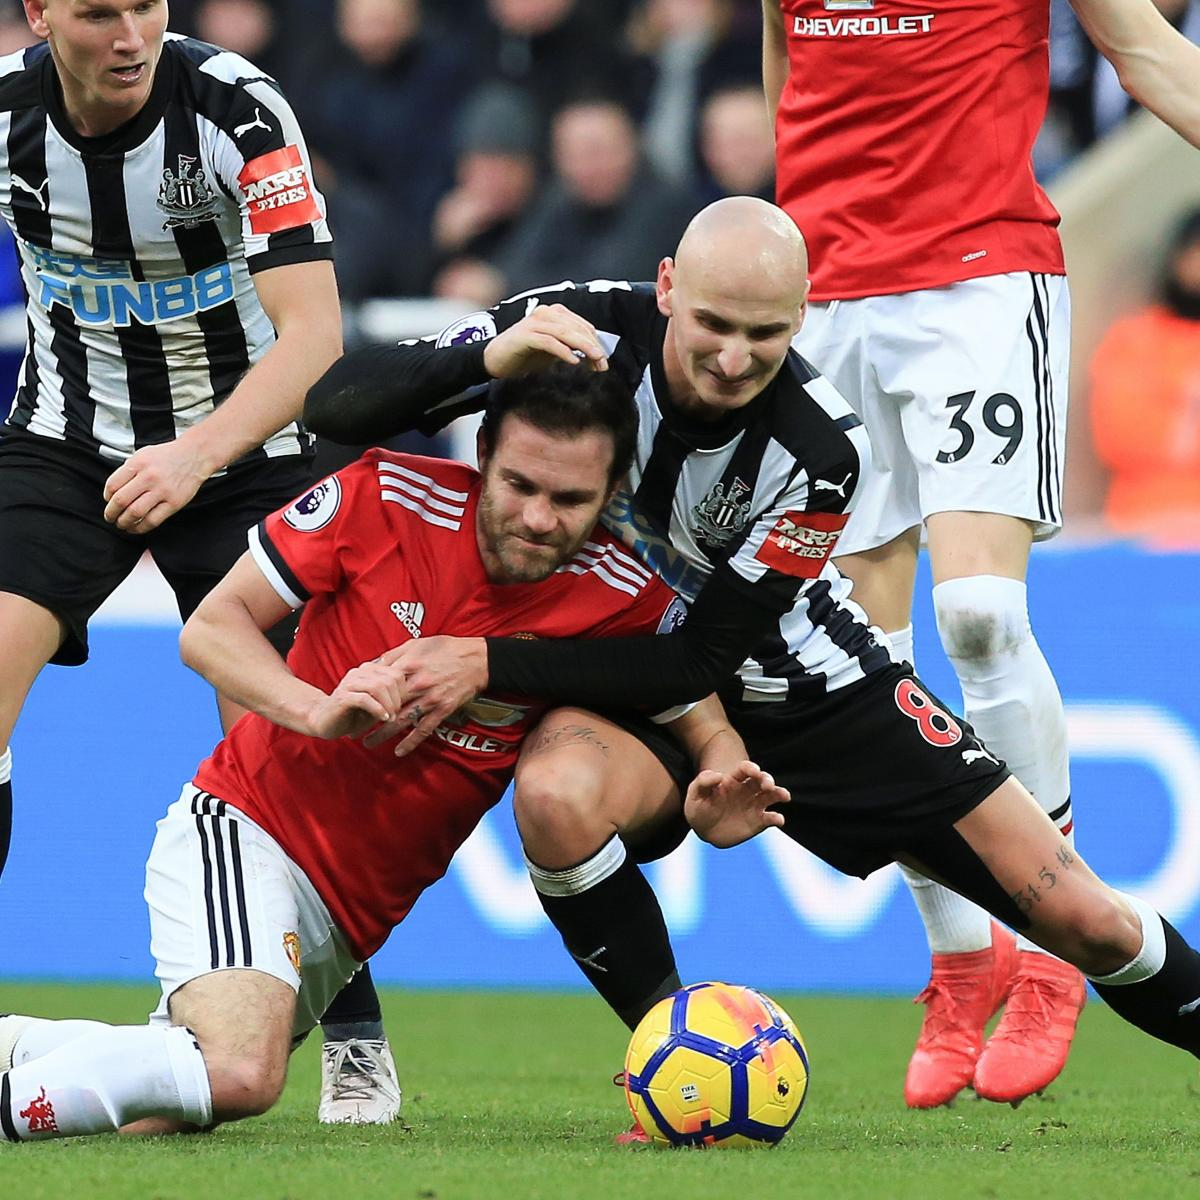 Tottenham 3 Fulham 1 Match Highlights Harry Kane Scores: Premier League Results Week 27: Sunday's 2018 EPL Scores